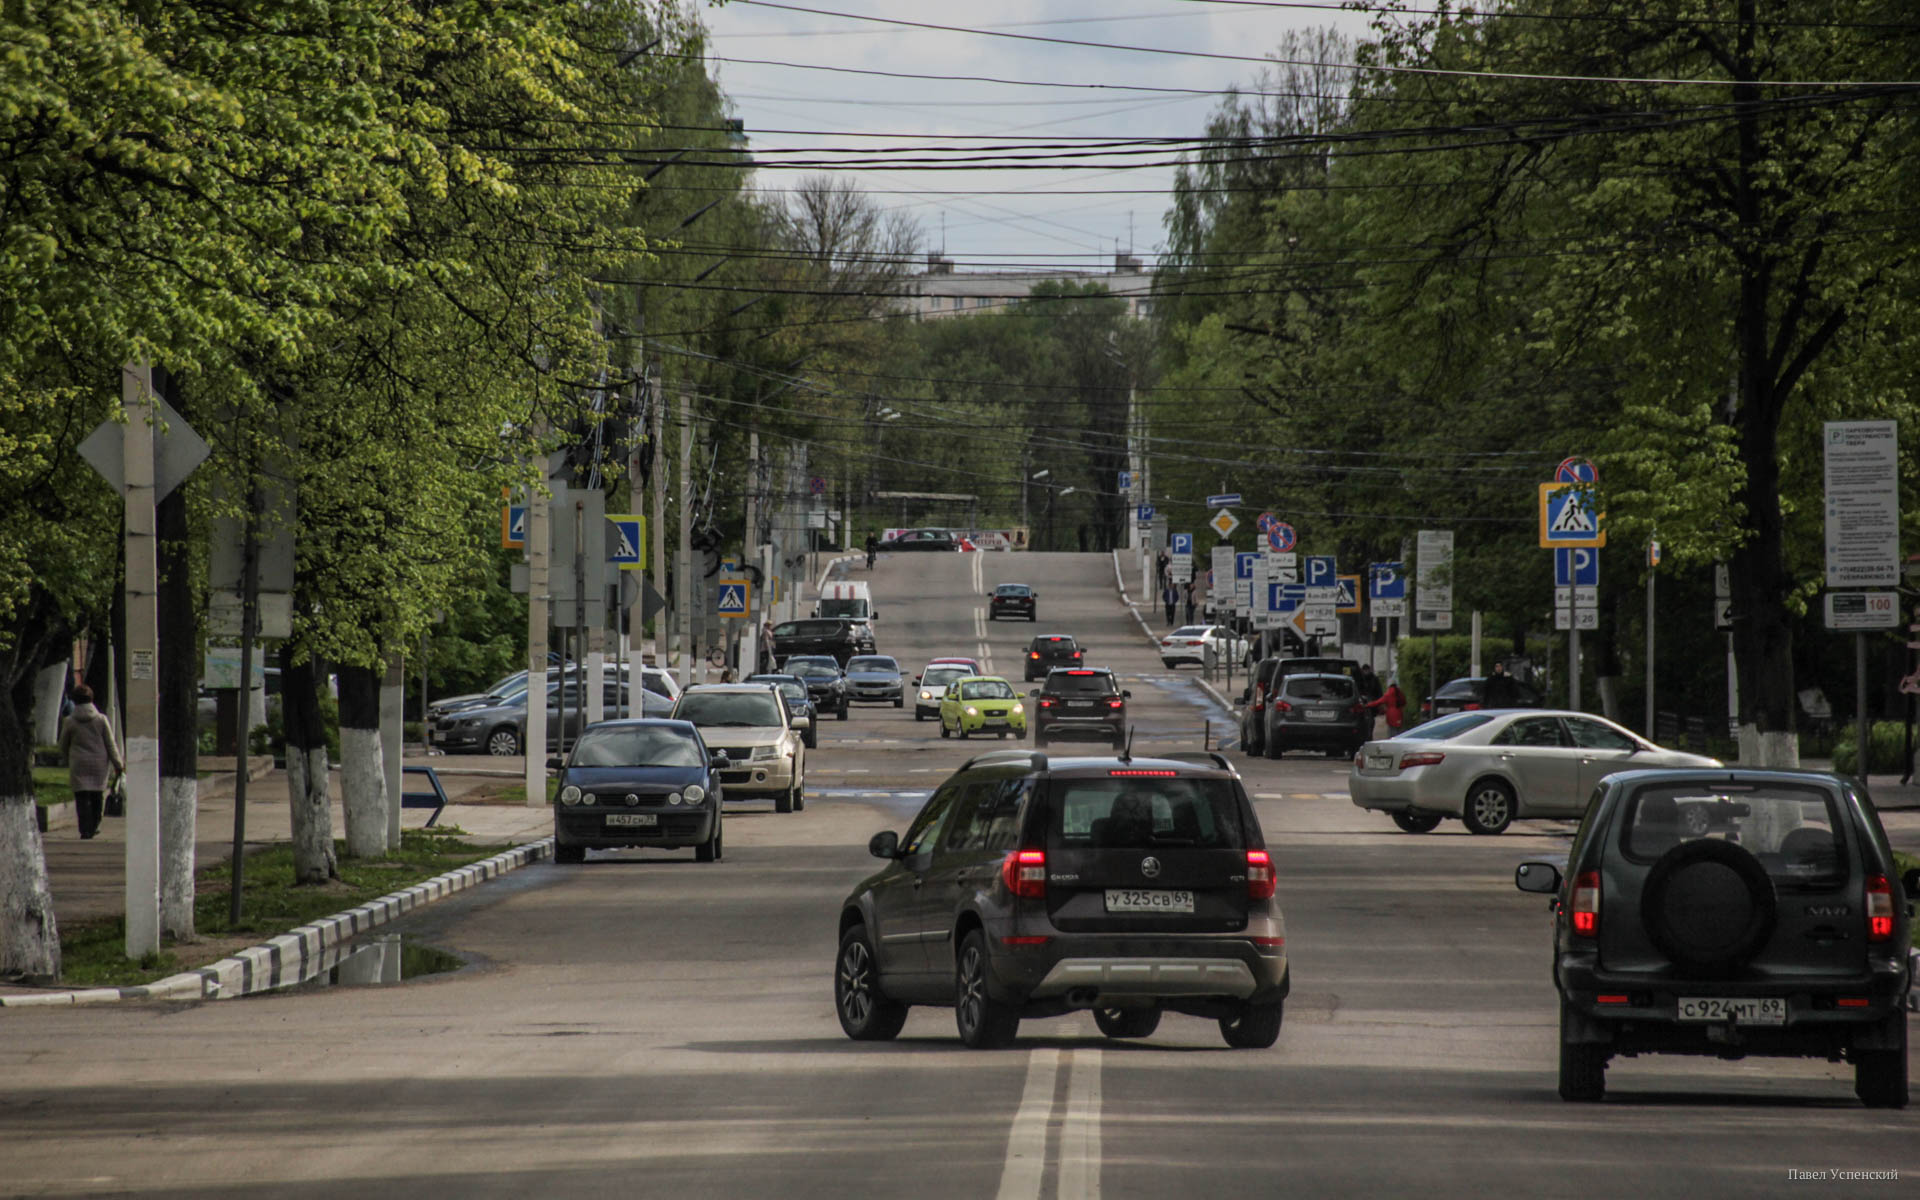 В Госдуме предложили поднять штрафы за езду без полиса ОСАГО - новости Афанасий